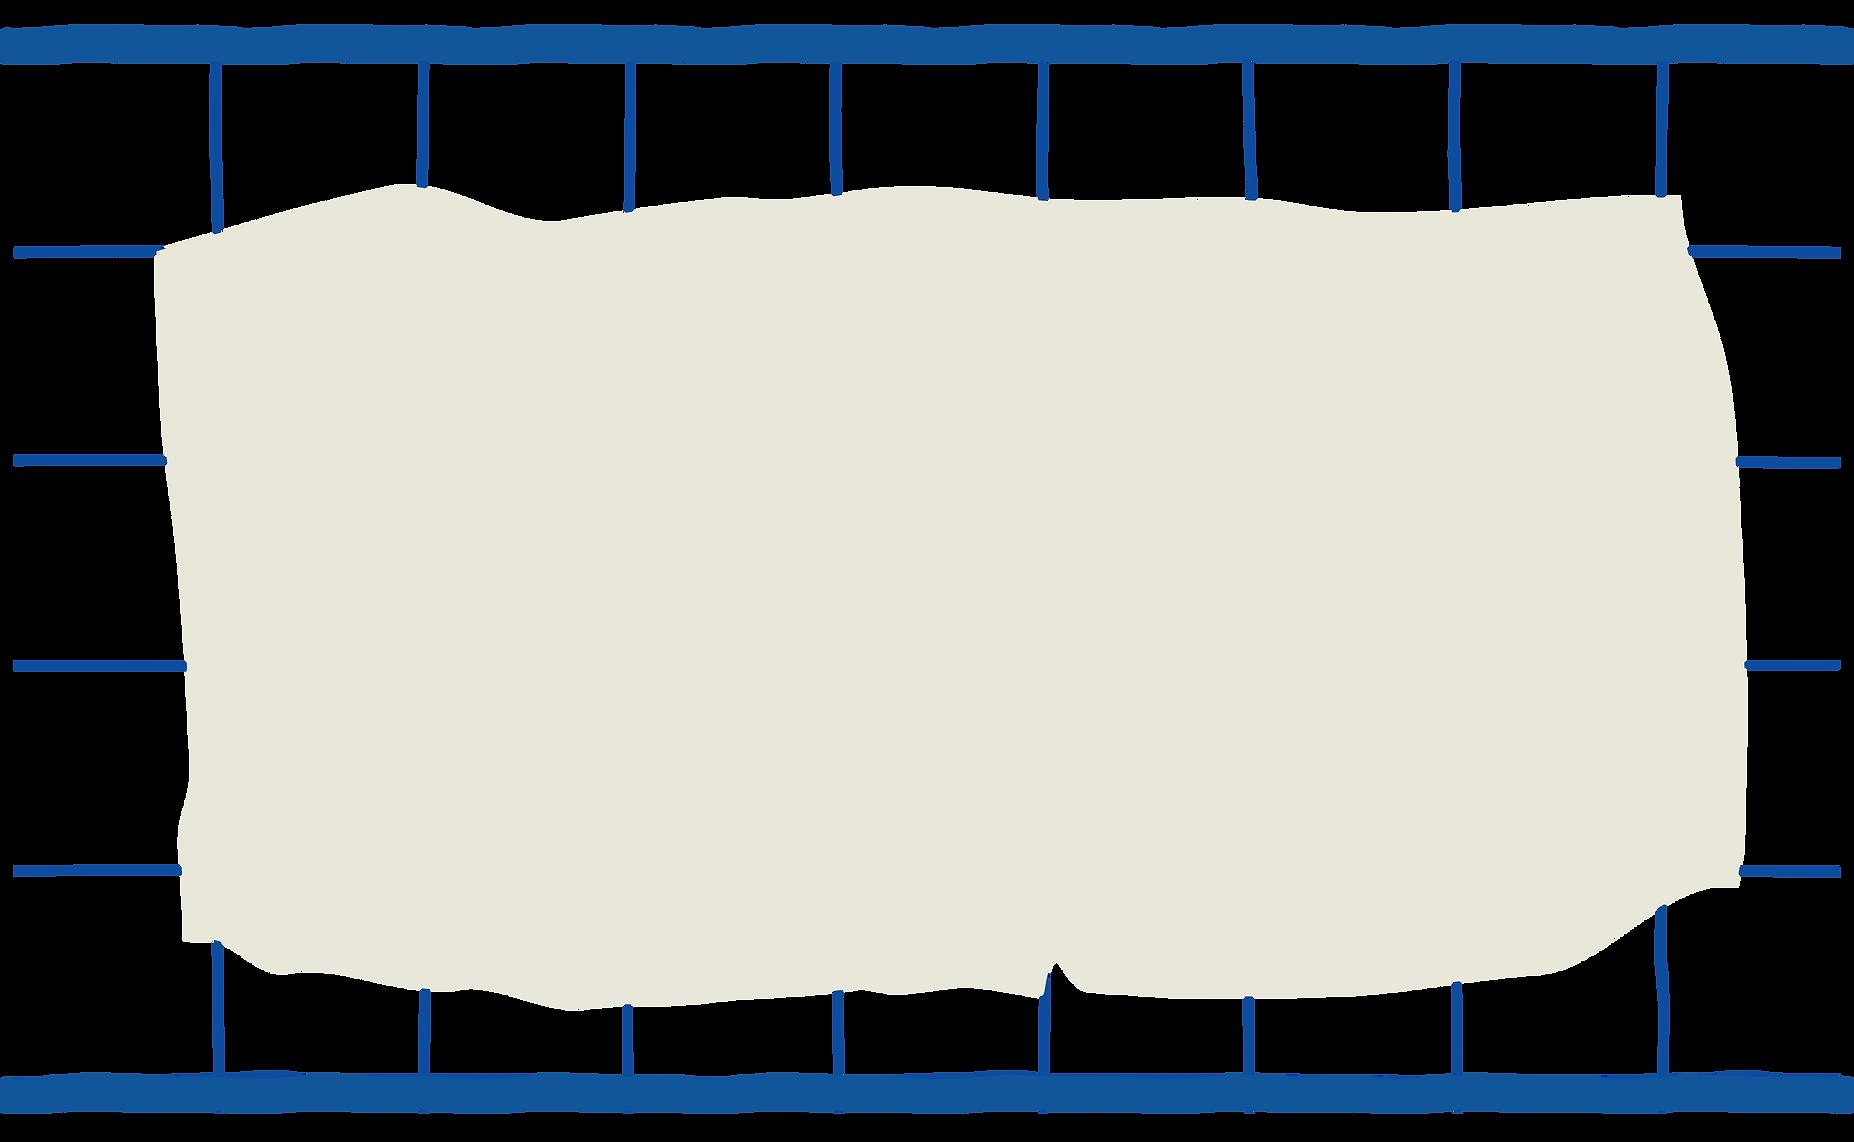 blue-box2.png